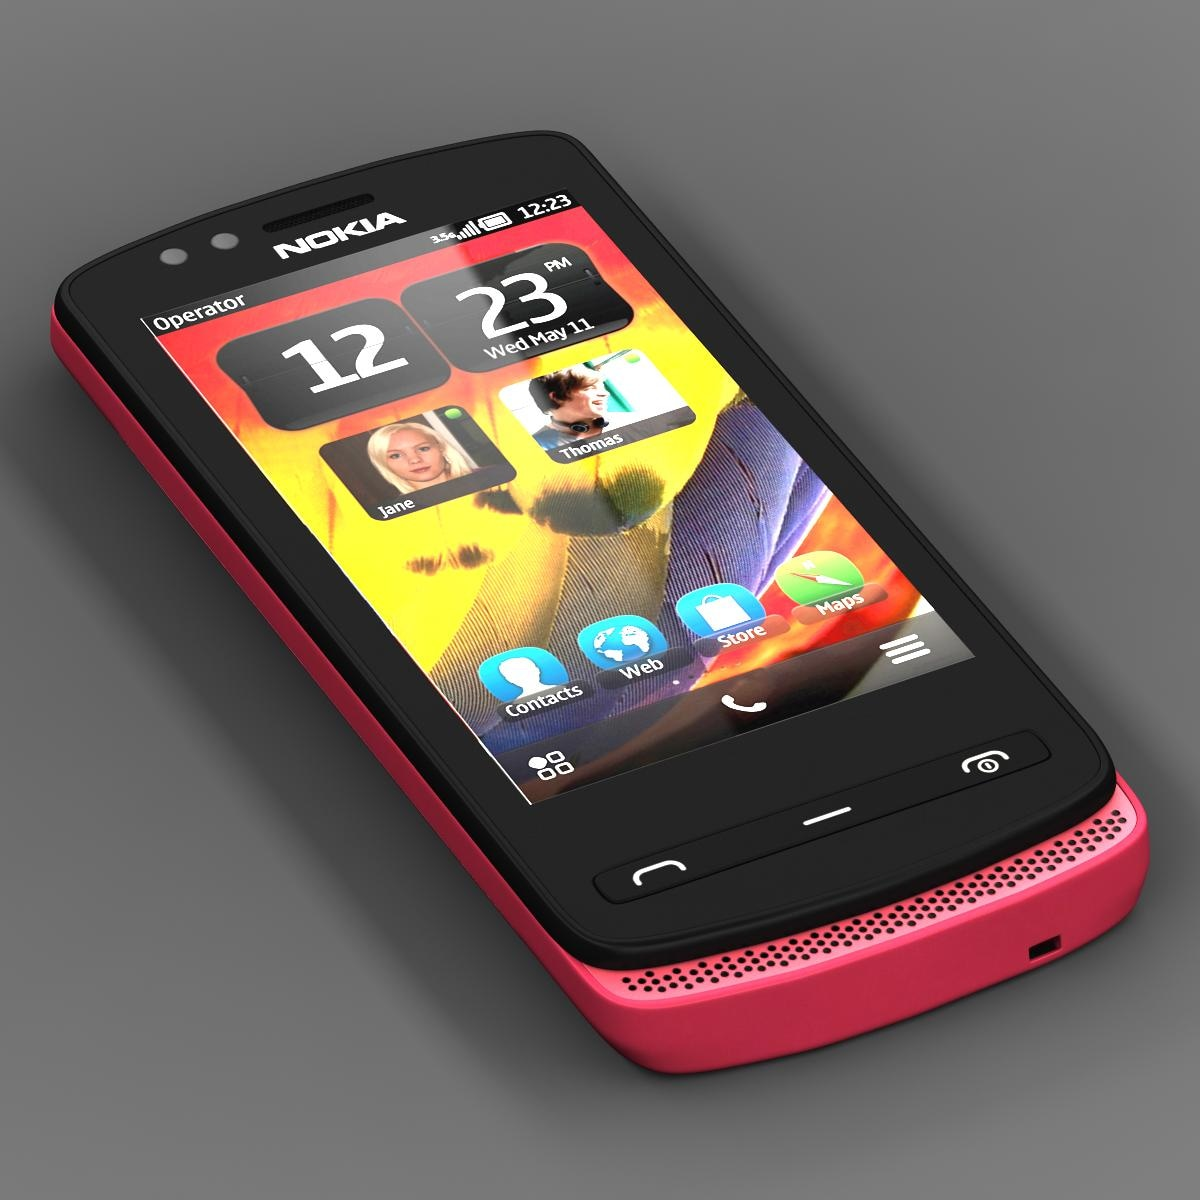 Nokia_700_Zeta_Red.jpg